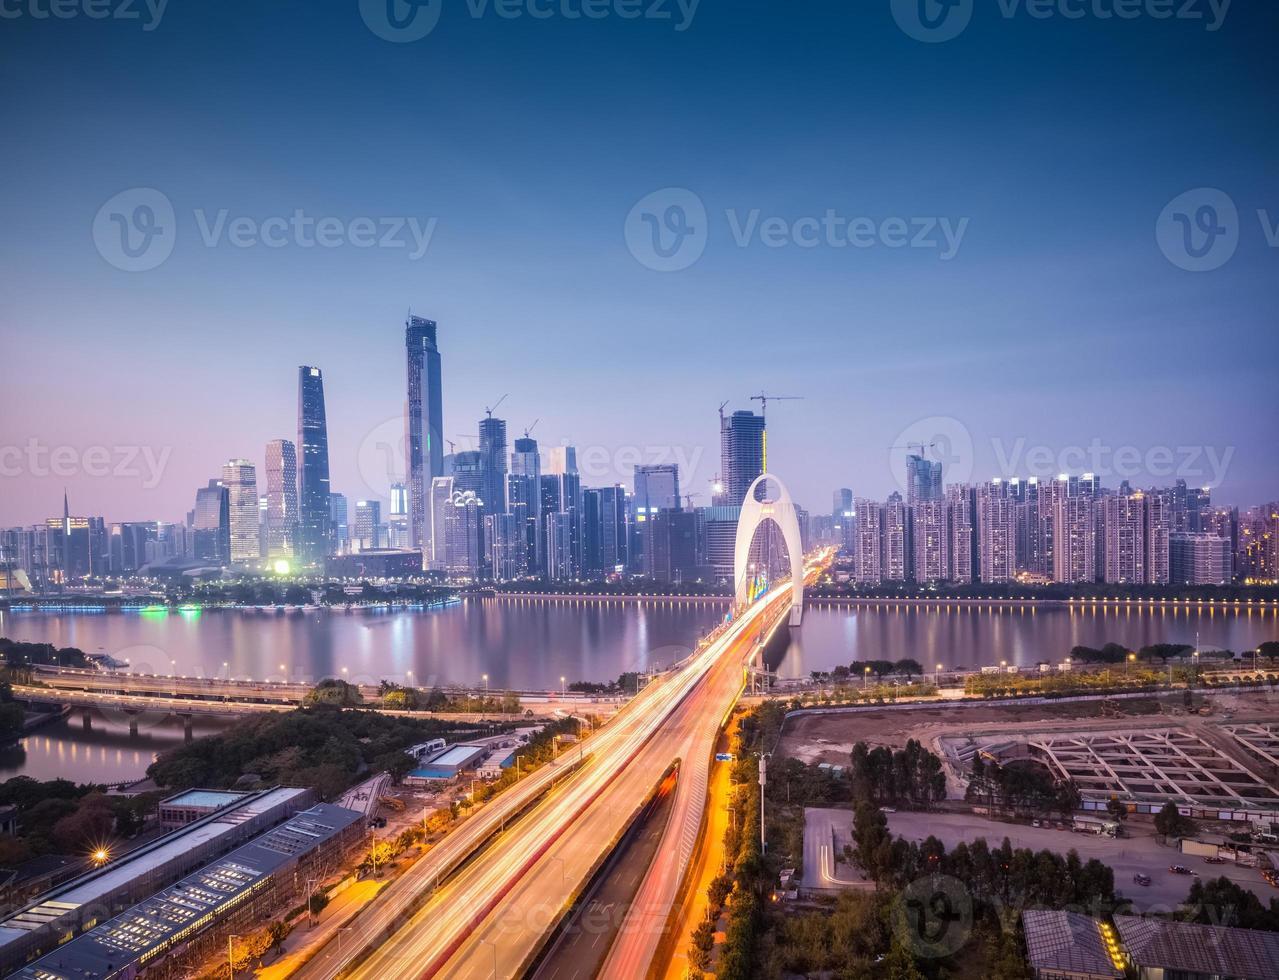 paesaggio urbano di Guangzhou nel crepuscolo foto